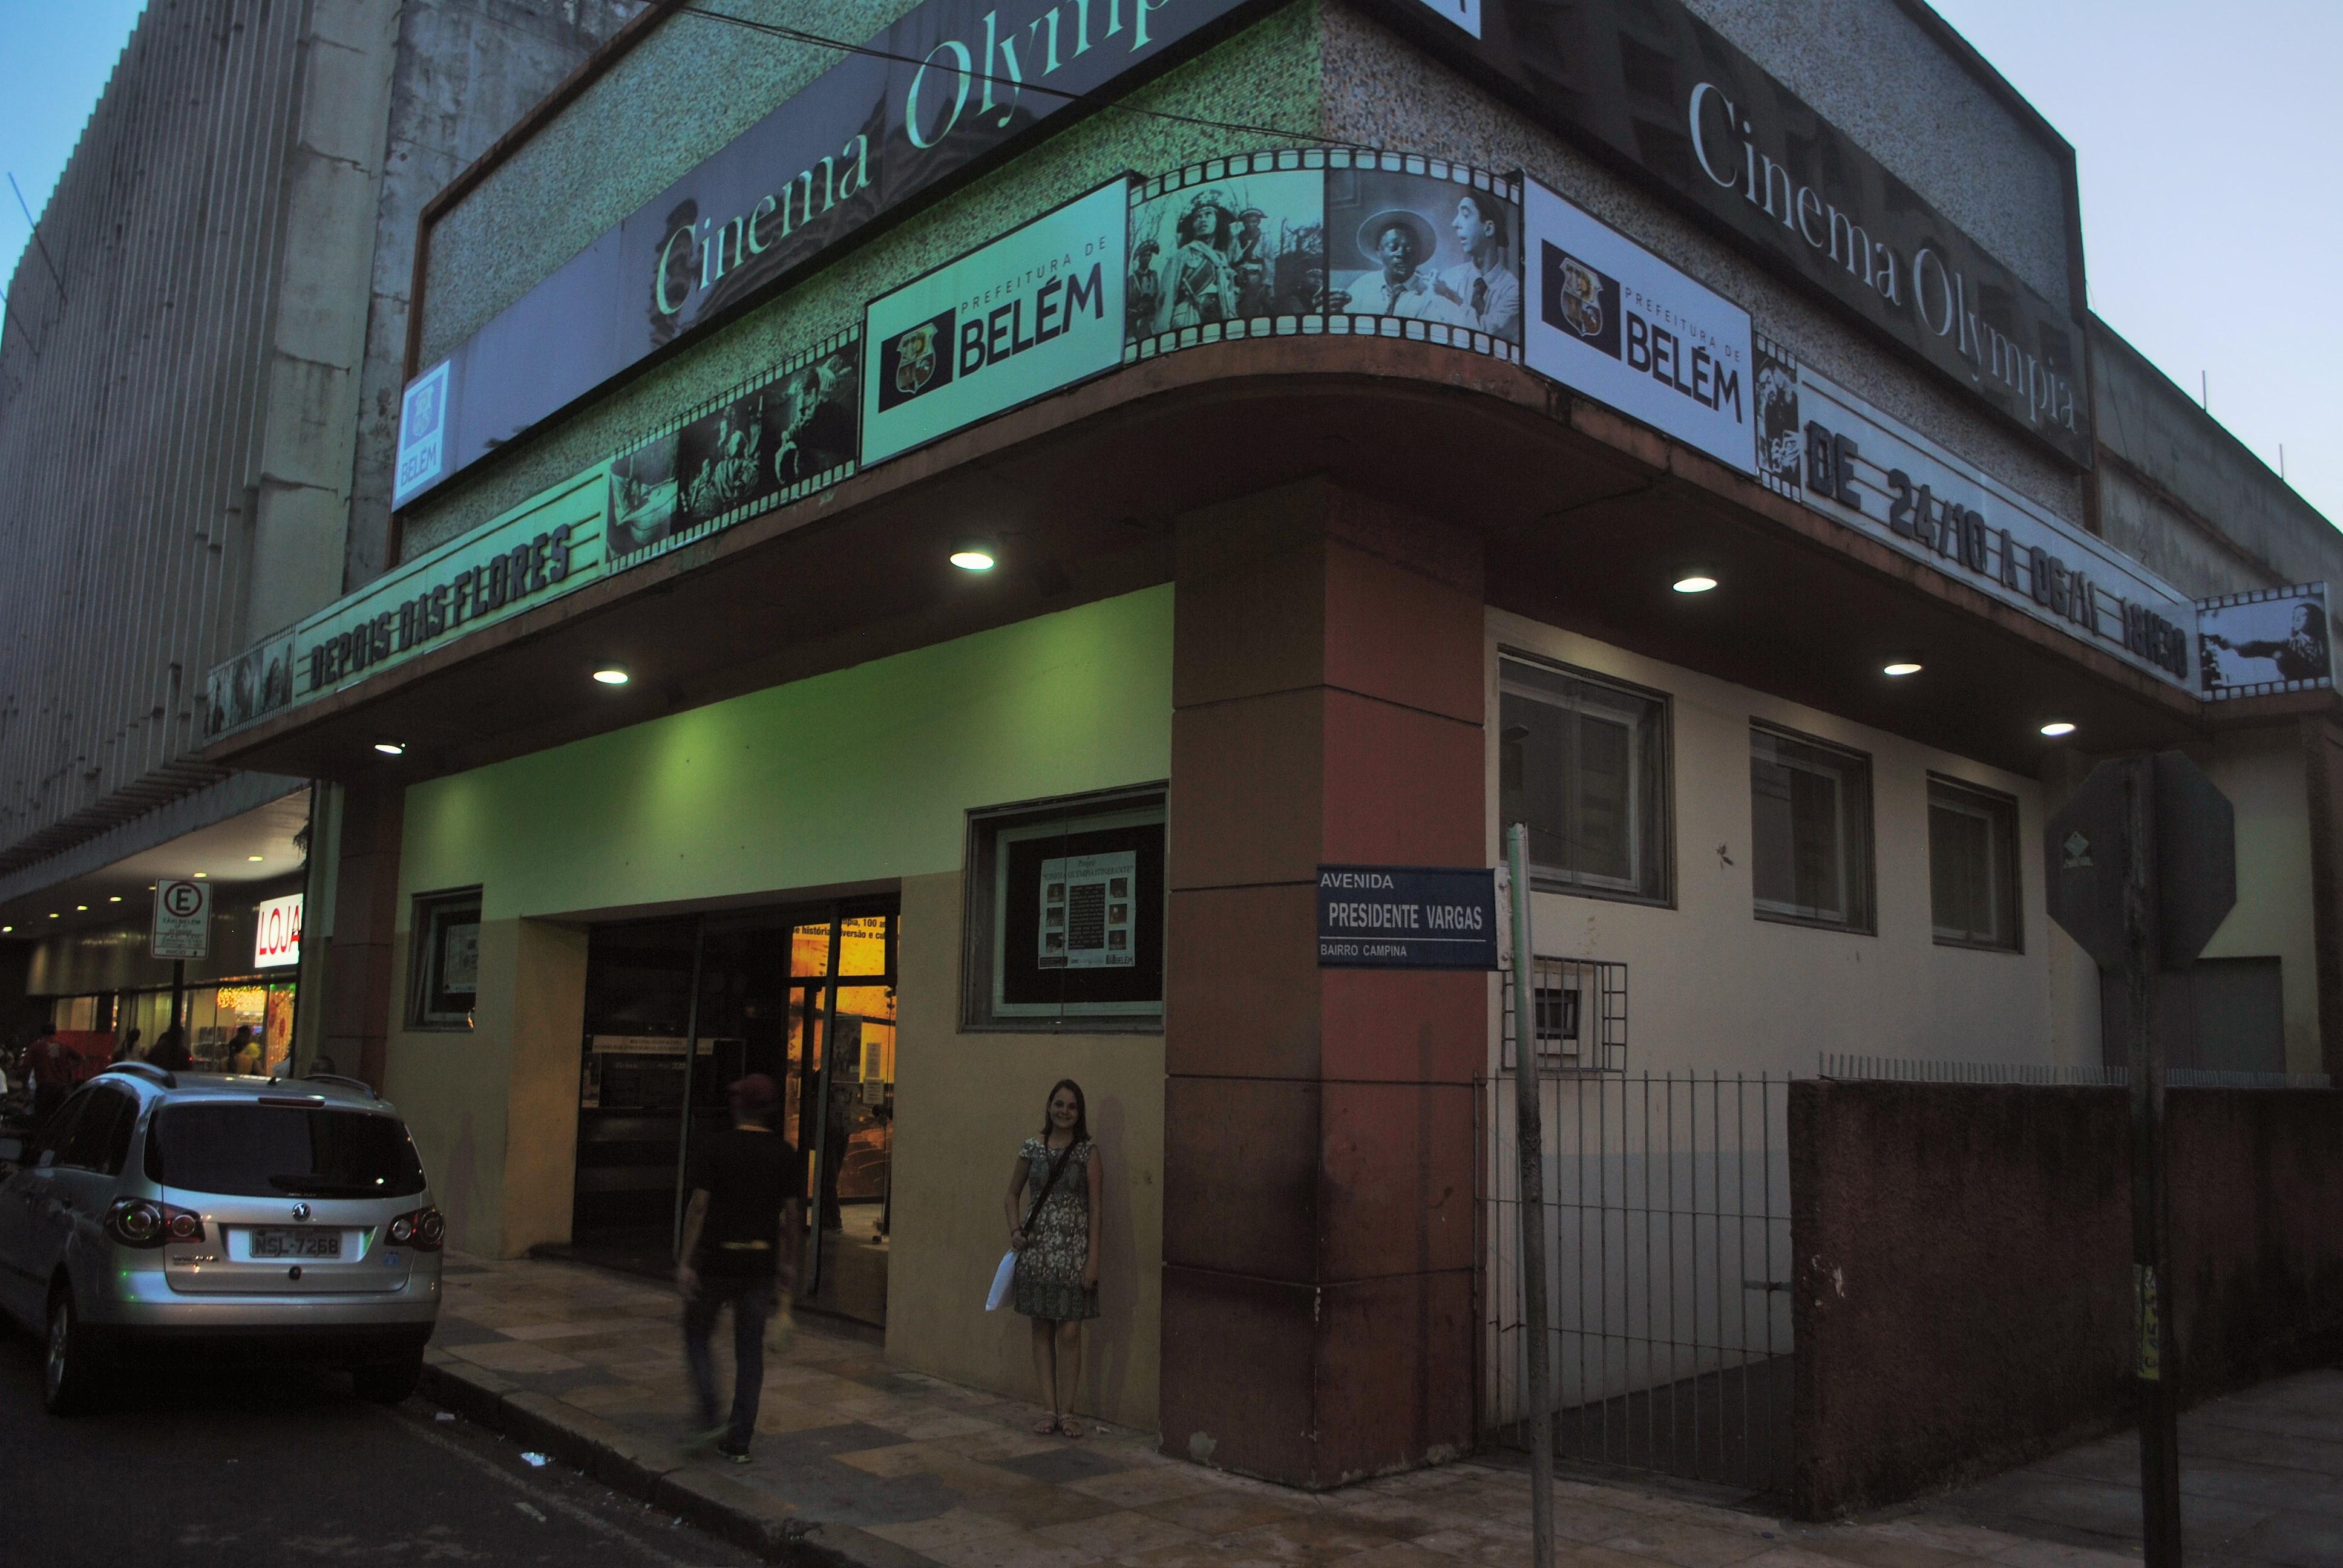 Fachada atual (Foto: Rosana Carvalho Paiva)